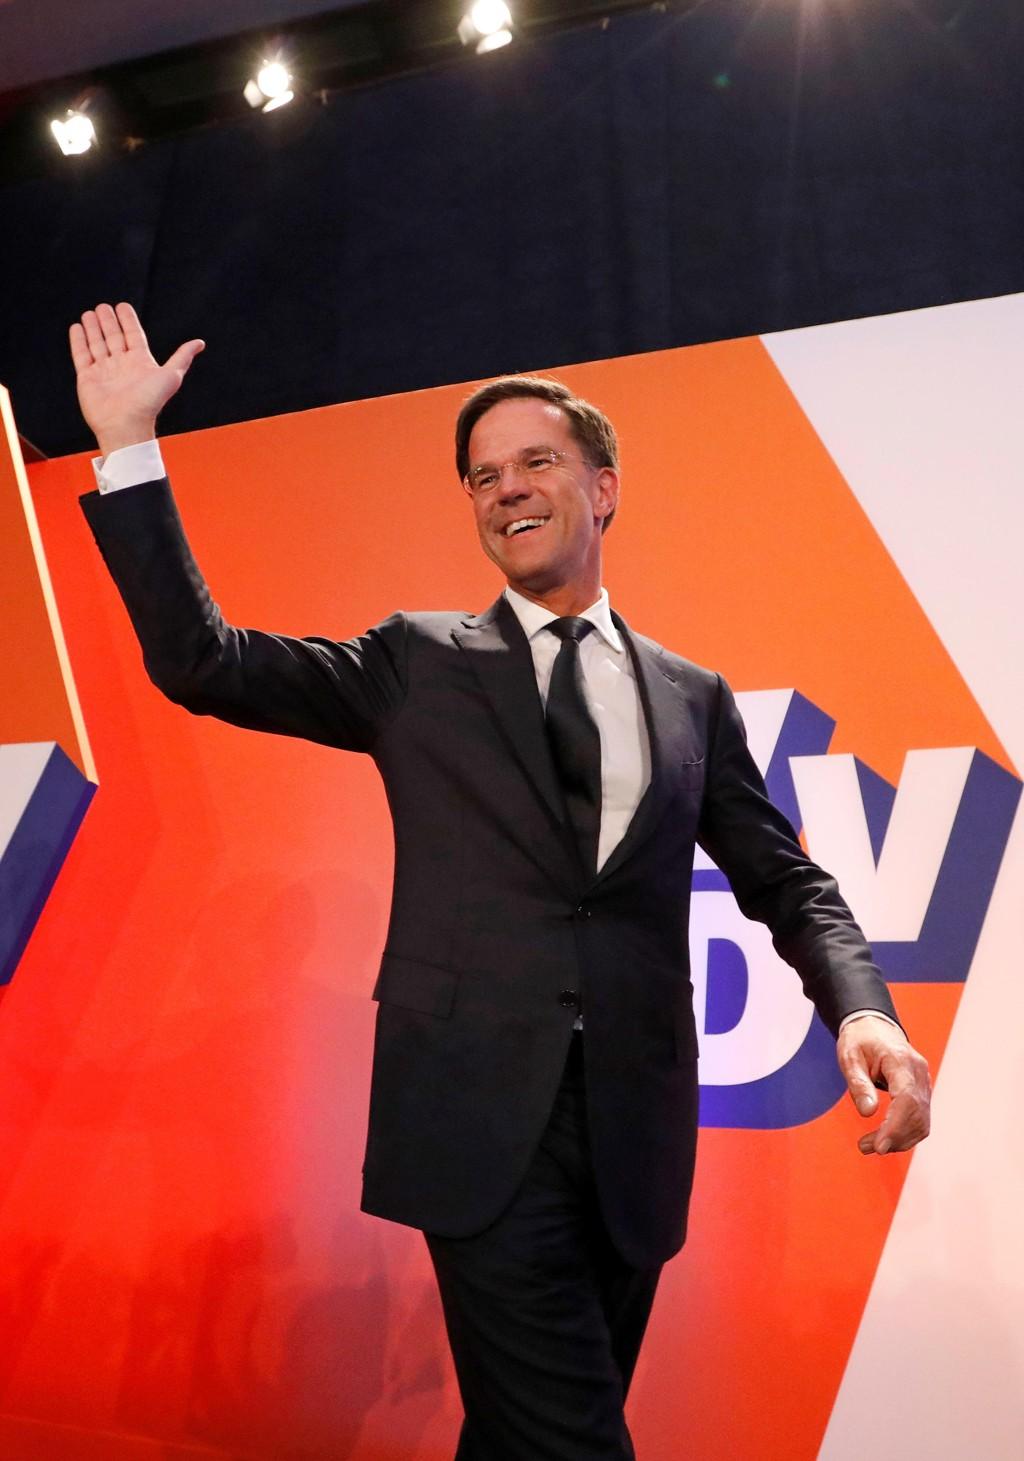 Rutte tros bli hollandsk premiarminister